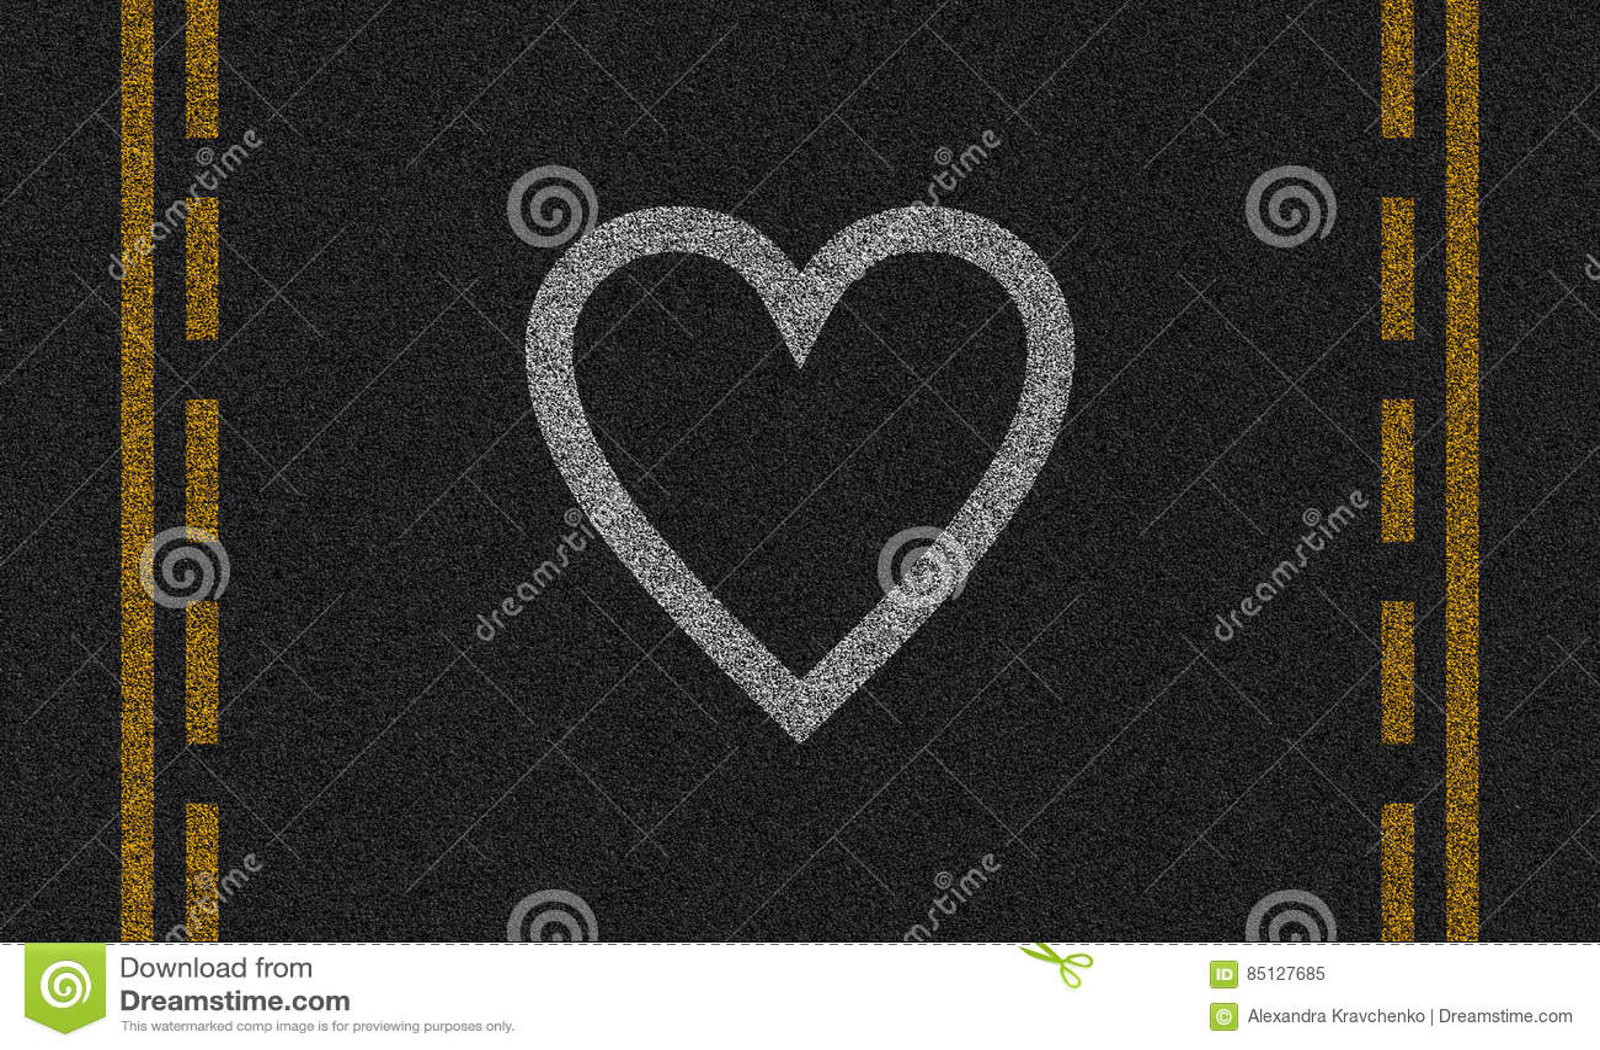 Asfaltachtergrond met geschilderd hart